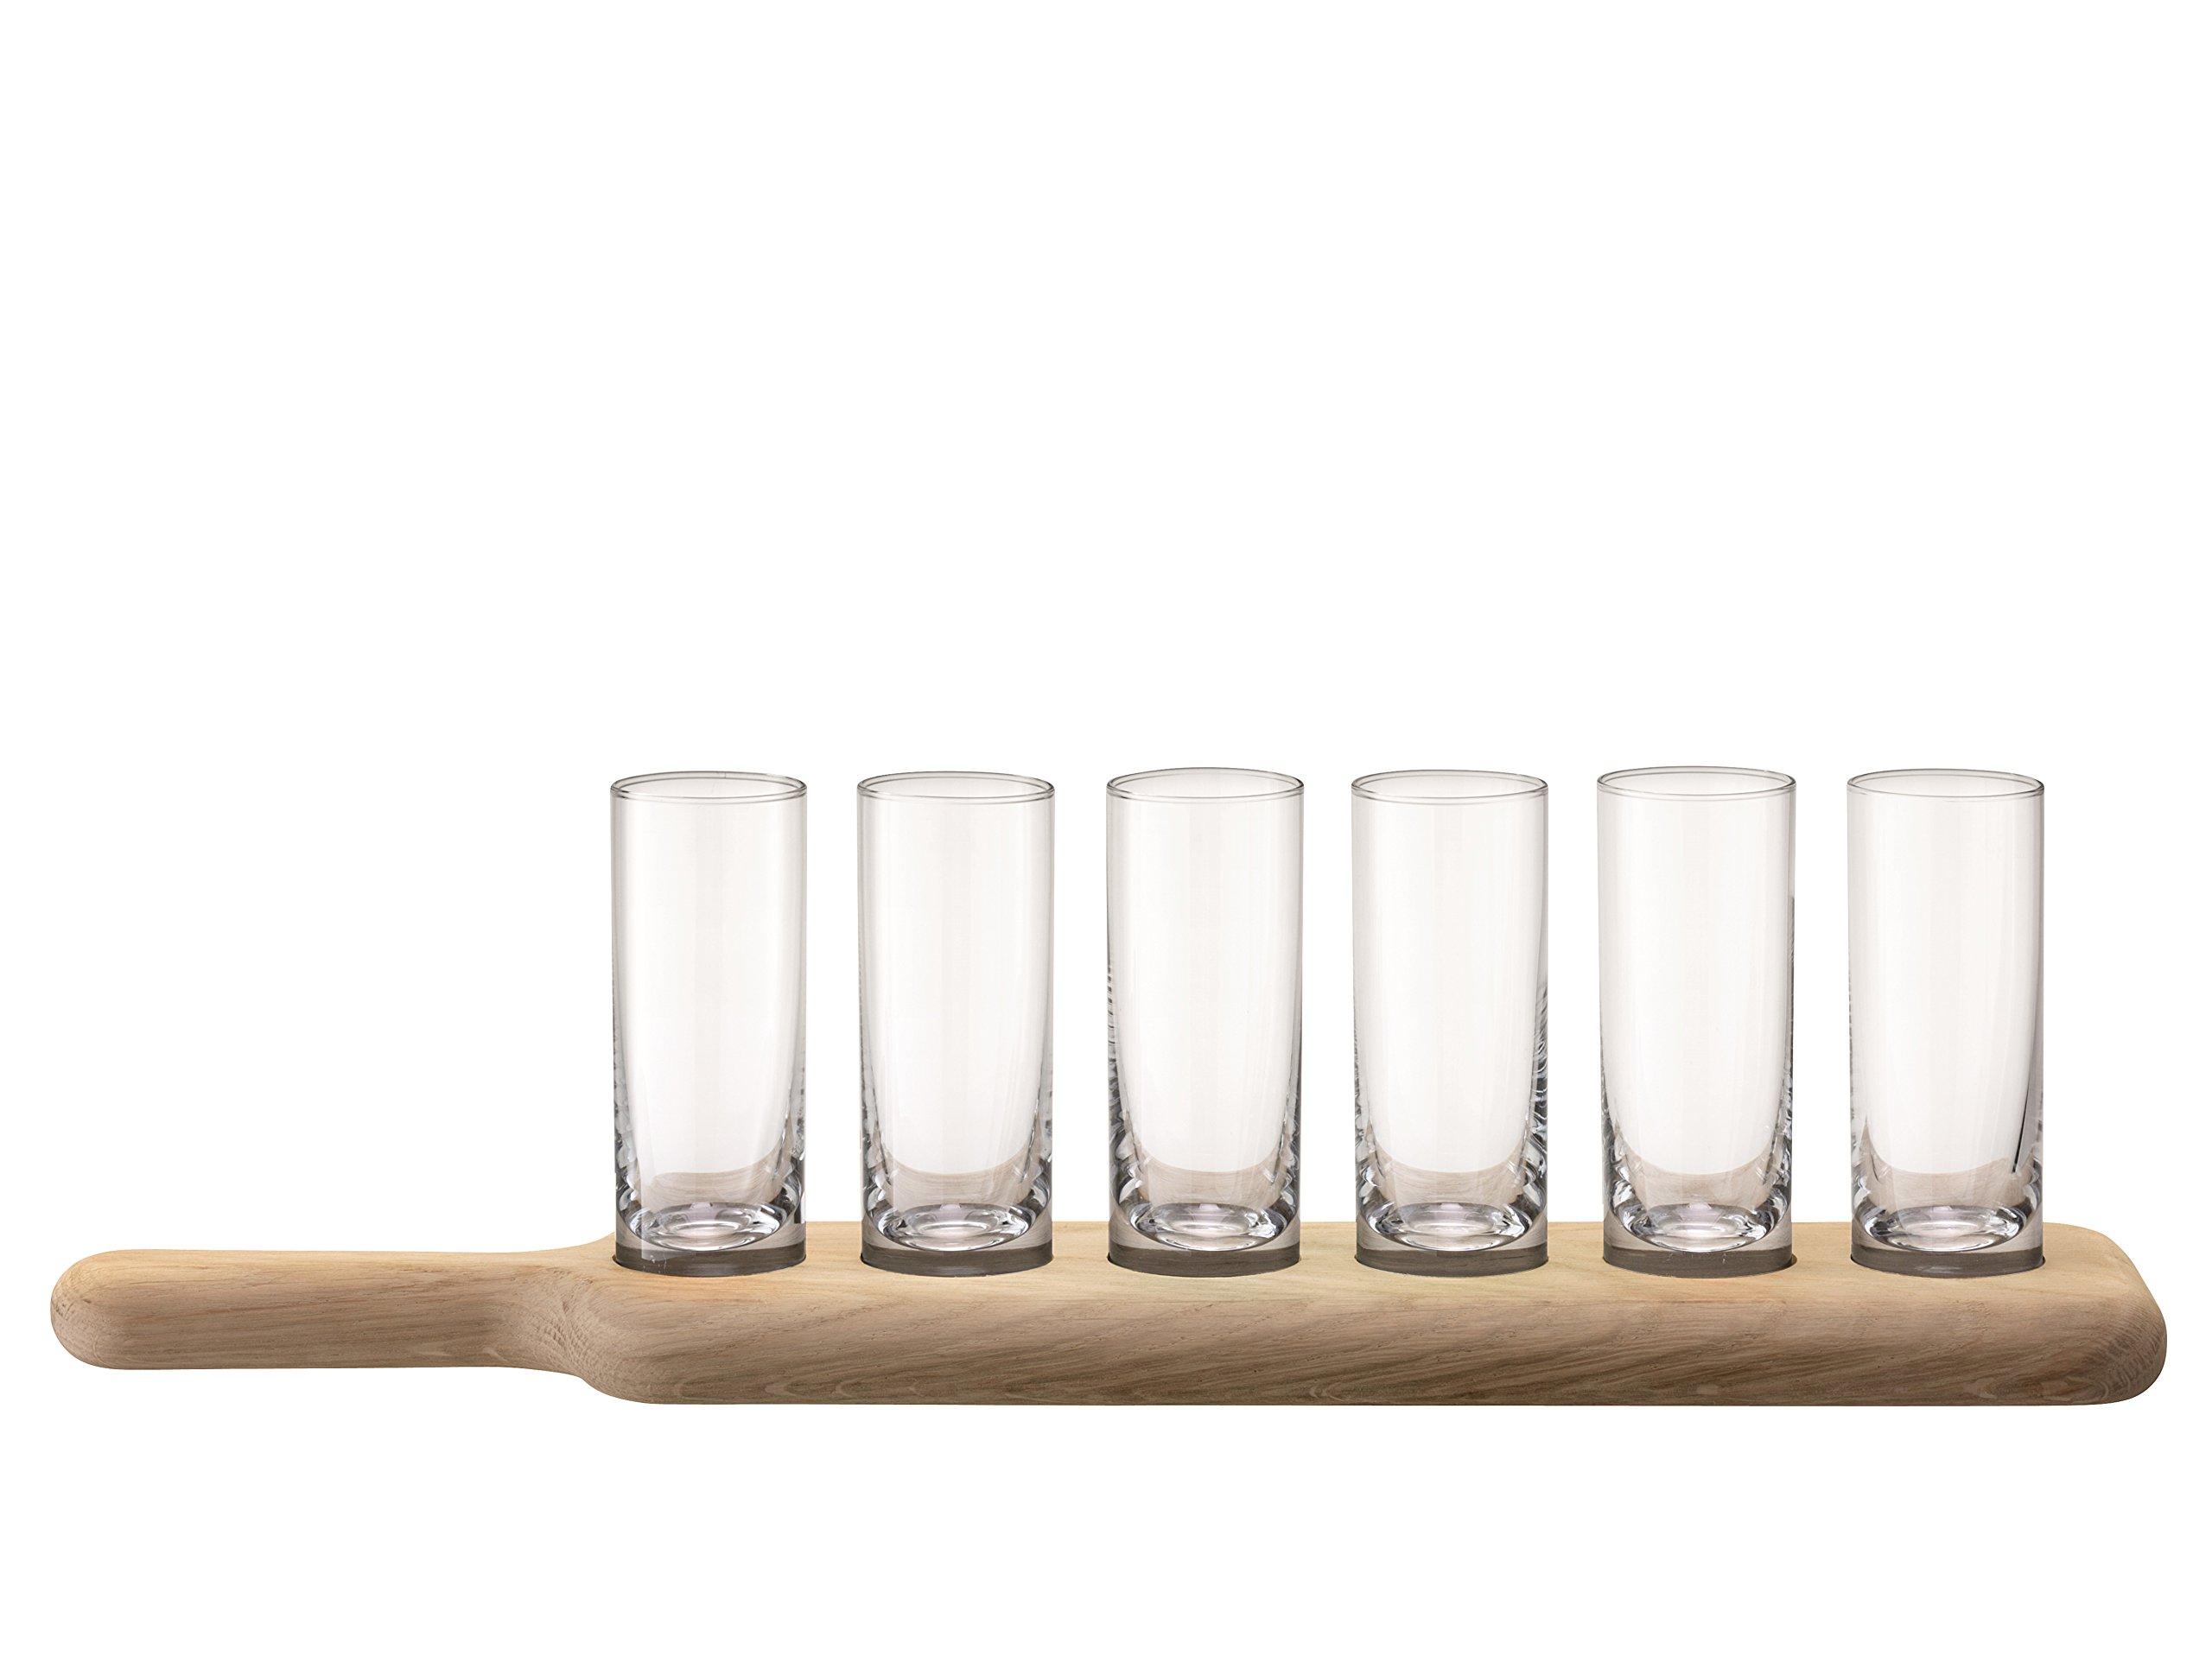 LSA International Shot Set & Oak Paddle, 15.75'', Clear